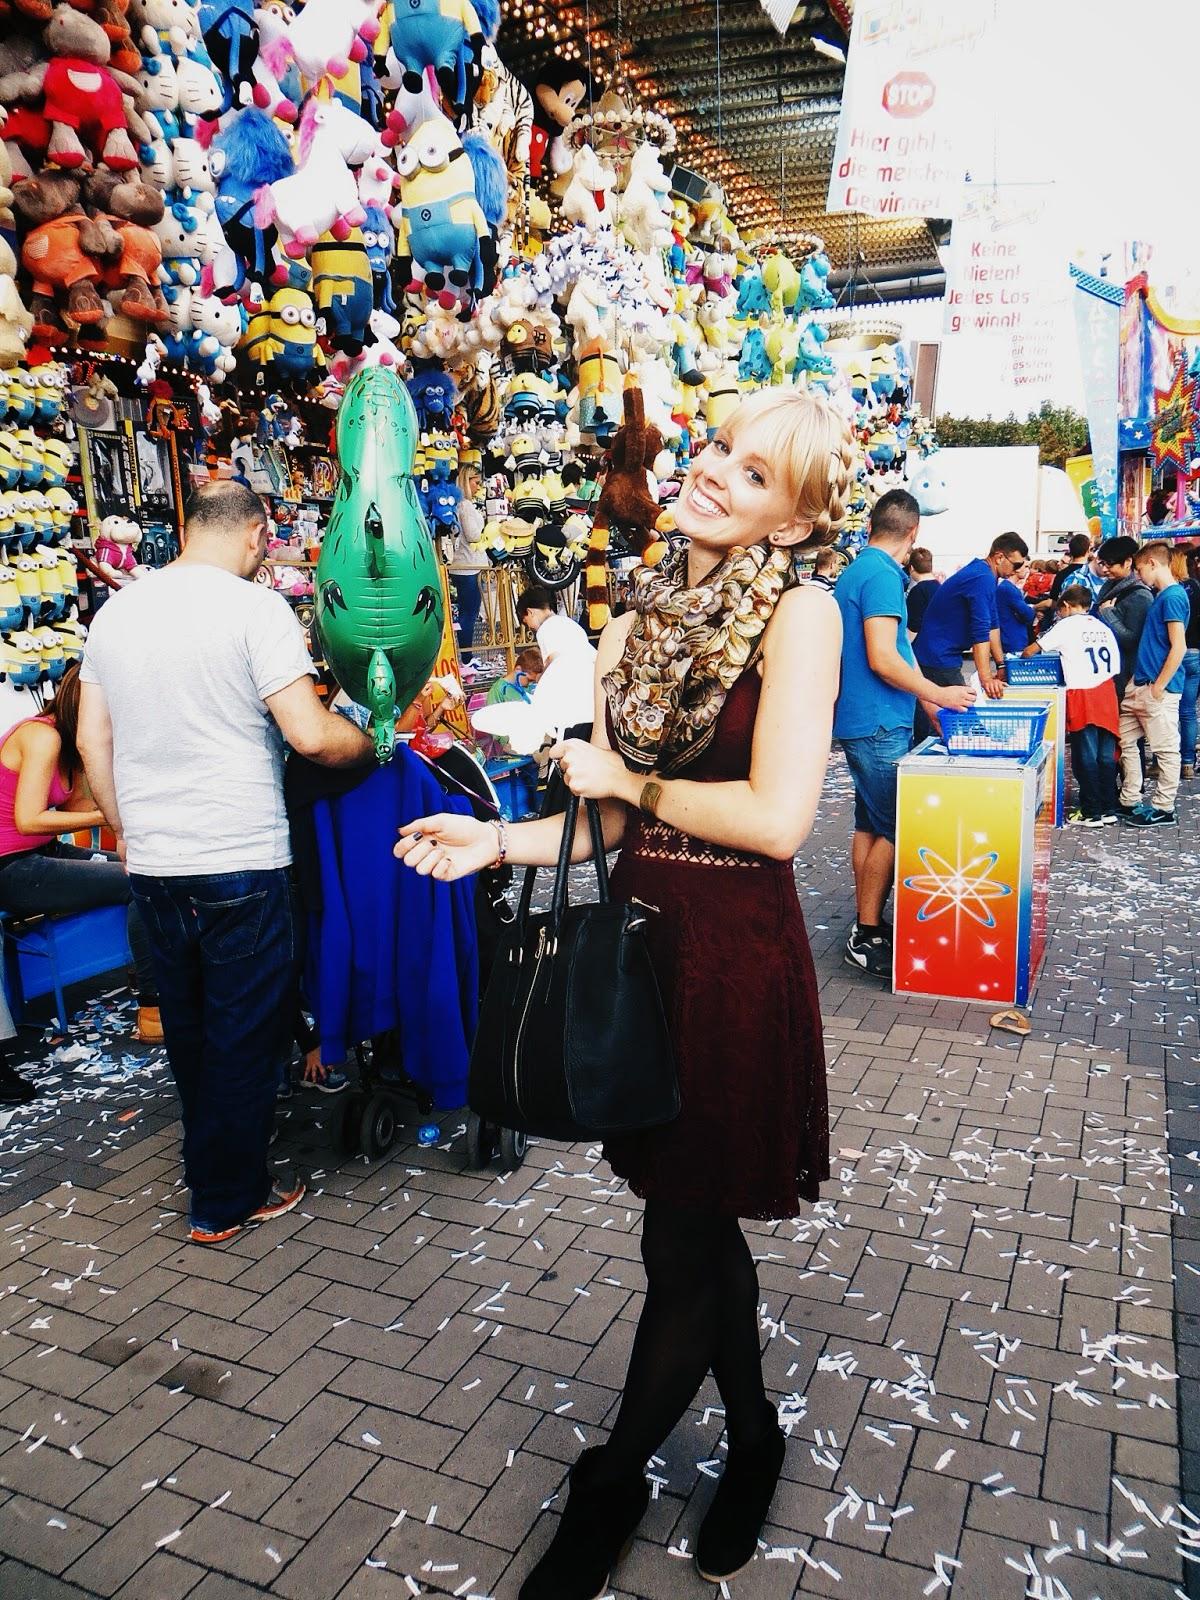 deb shops maroon illusion dress, black tights, deb shops black booties, deb shops oversized black satchel, vintage scarf, milkmaid braids, festival style, fall festival, bad durkheim wine festival, germany festival